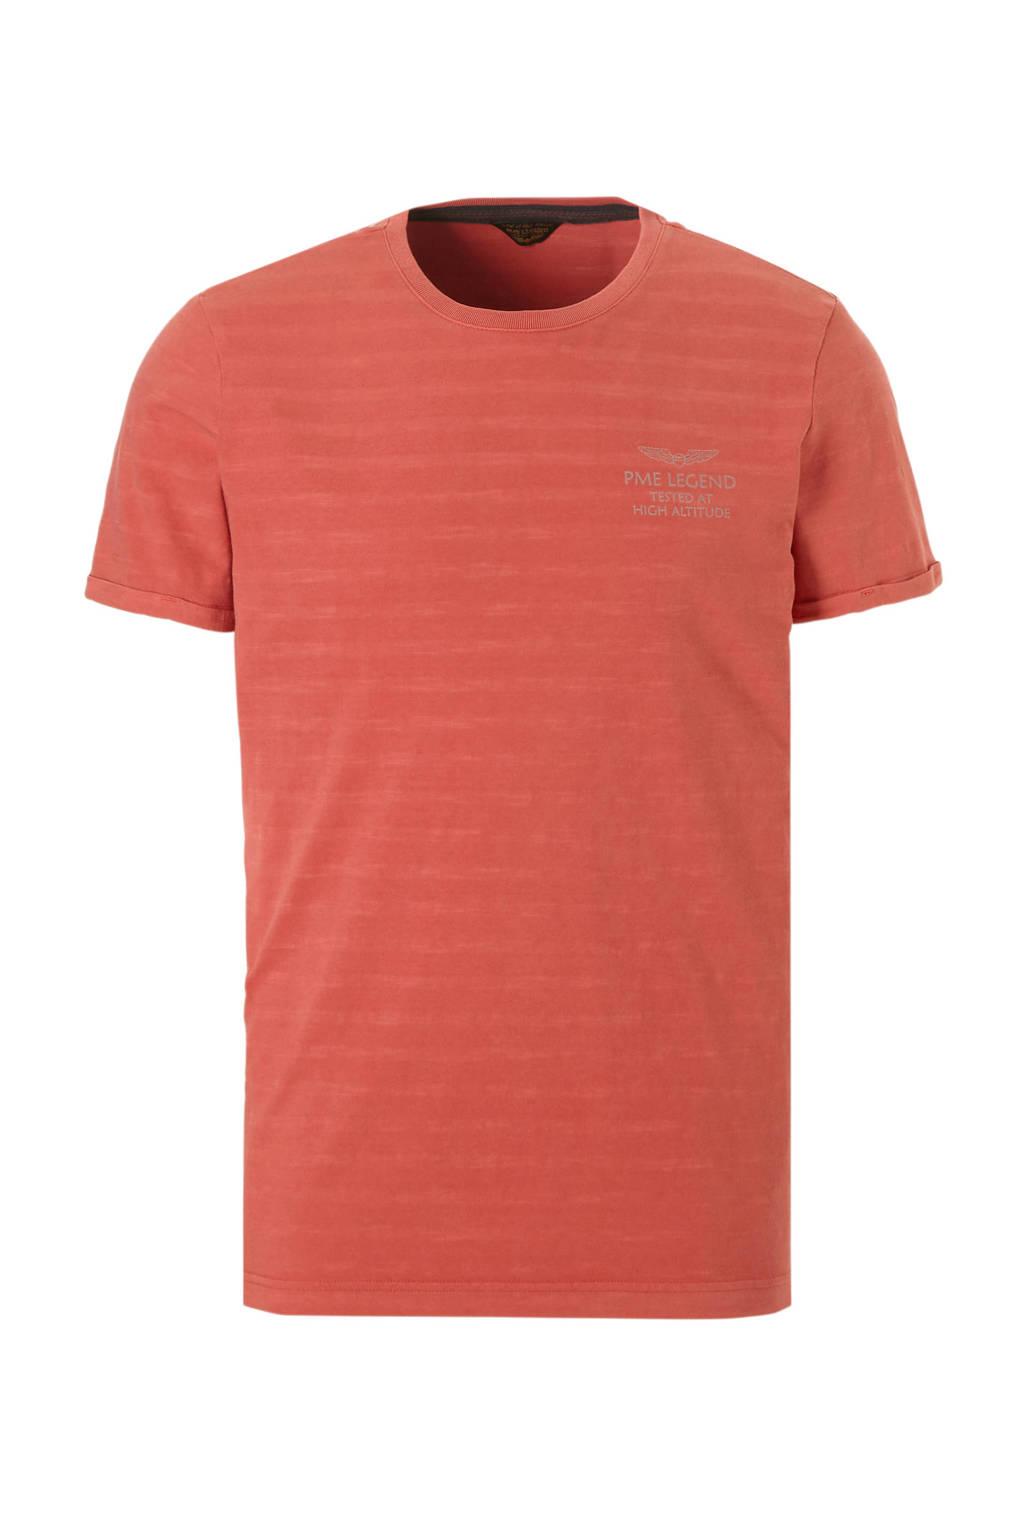 PME Legend T-shirt, Zalm